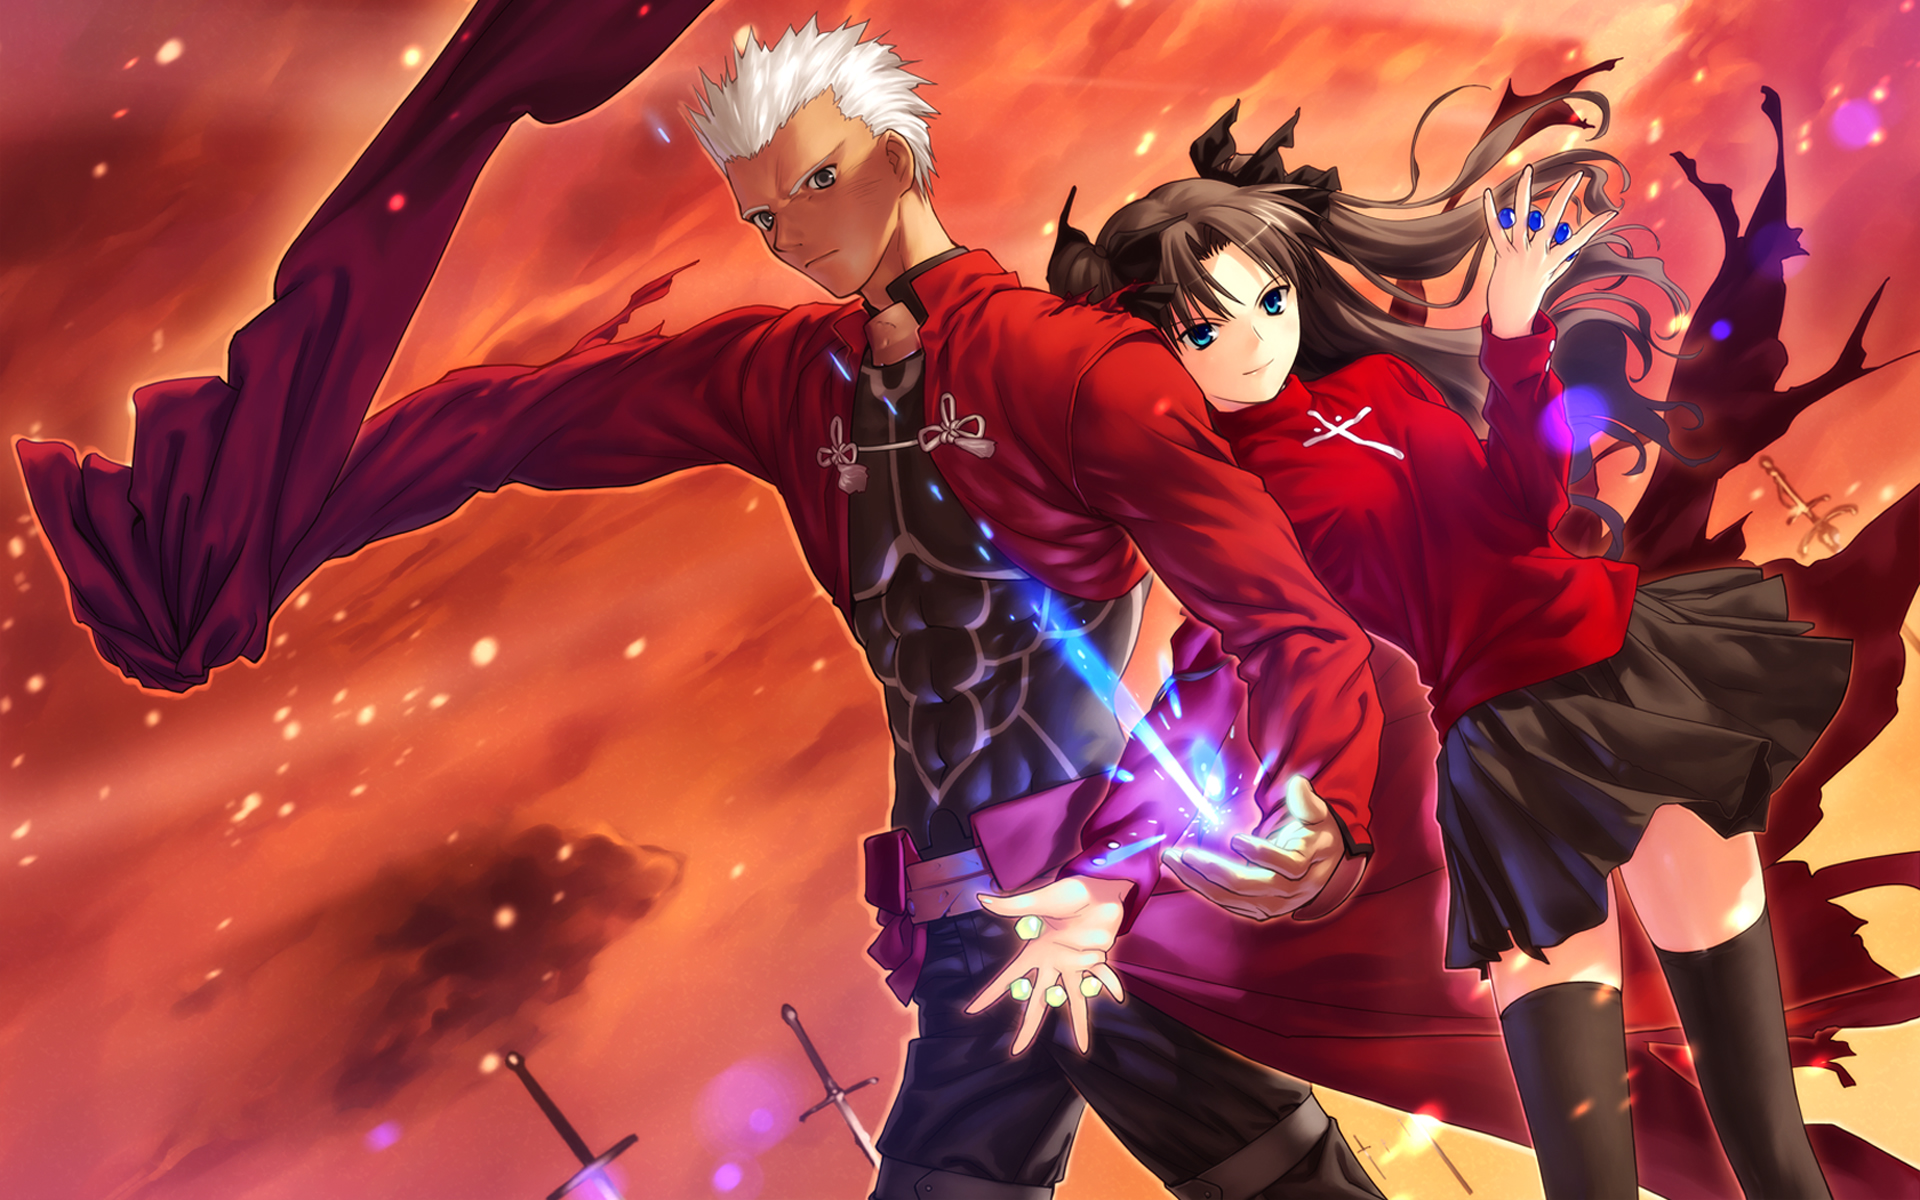 Fate Stay Night Unlimited Blade Works私は刀士郎の骨 運命の夜の壁紙 19x10 Wallpapertip